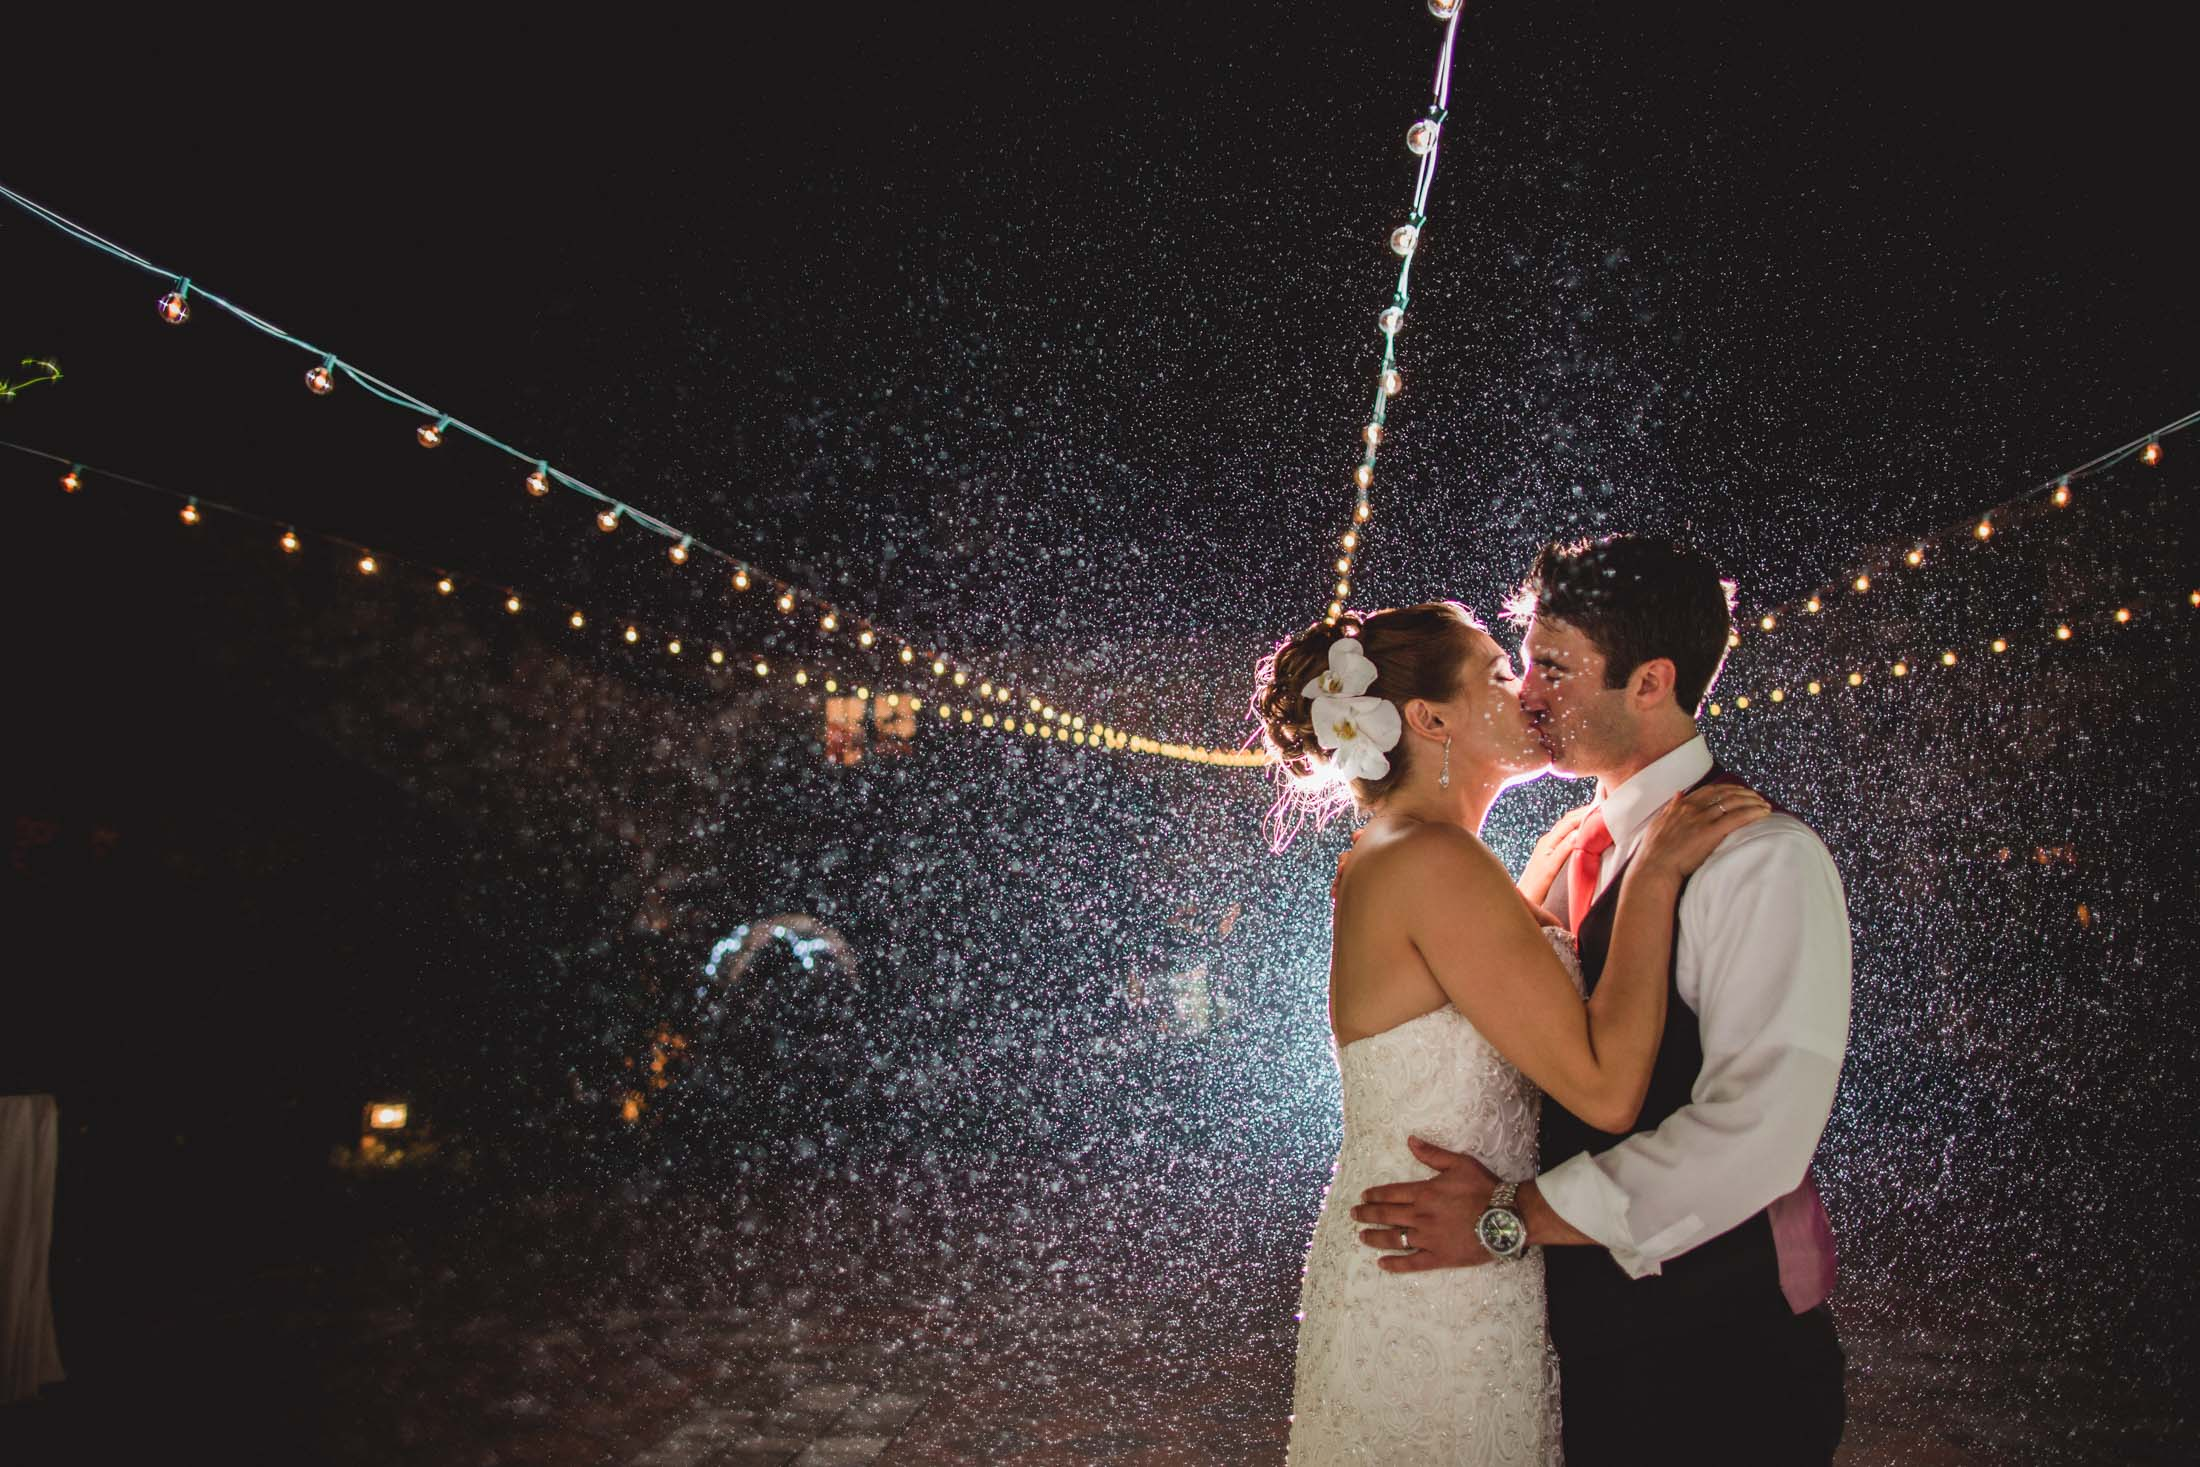 Willowdale-wedding-photography-38.jpg